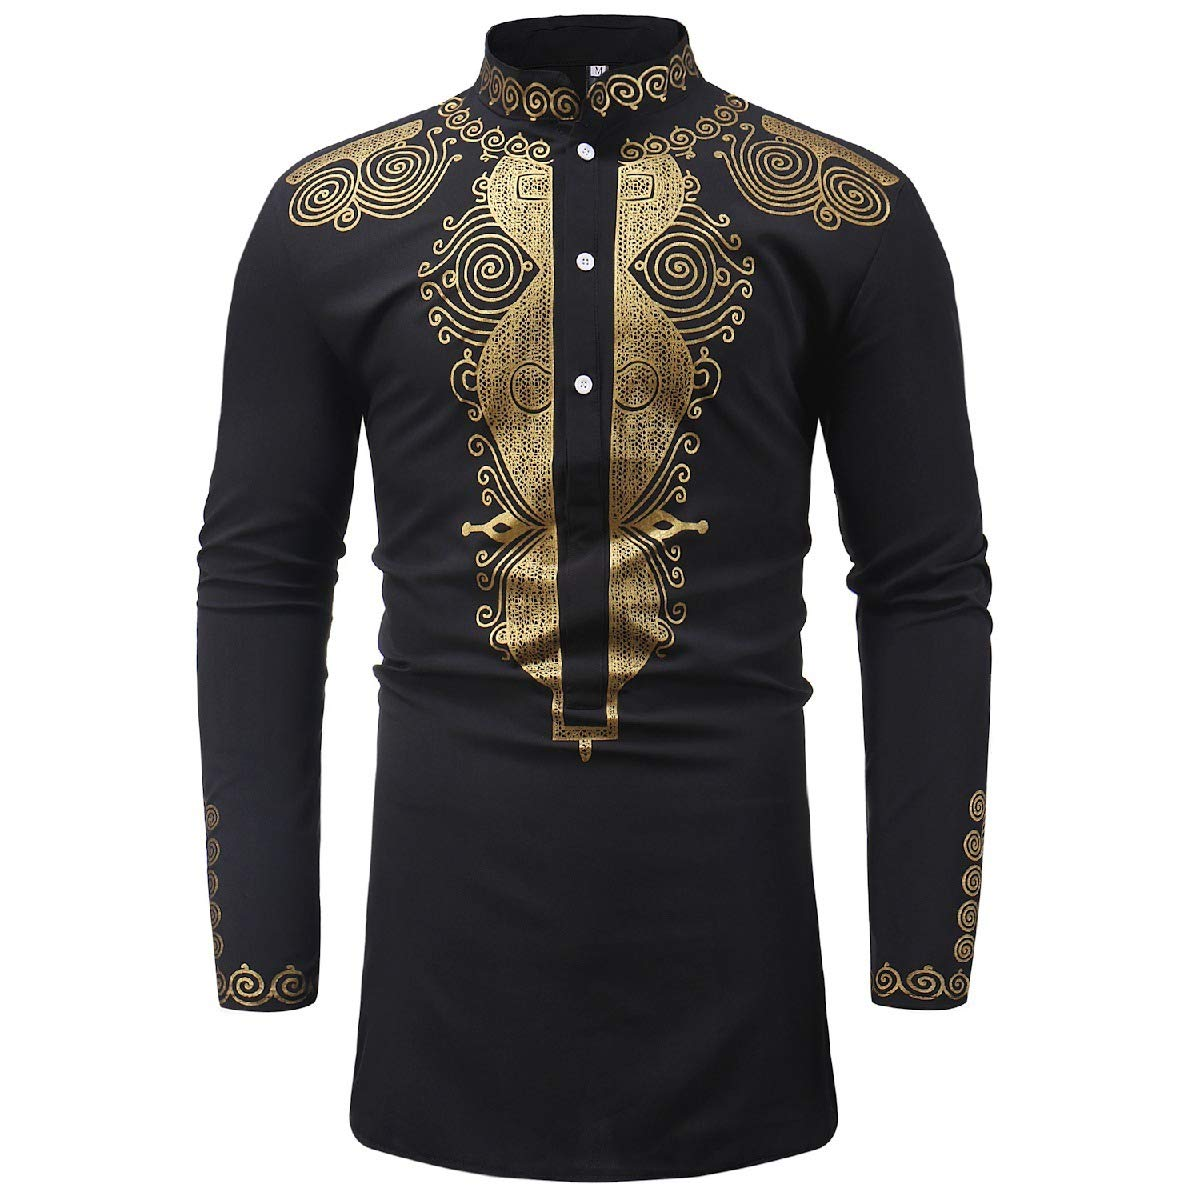 Sebaby Mens African Ethnic Style Stand Collar Long-Sleeve Longshirt